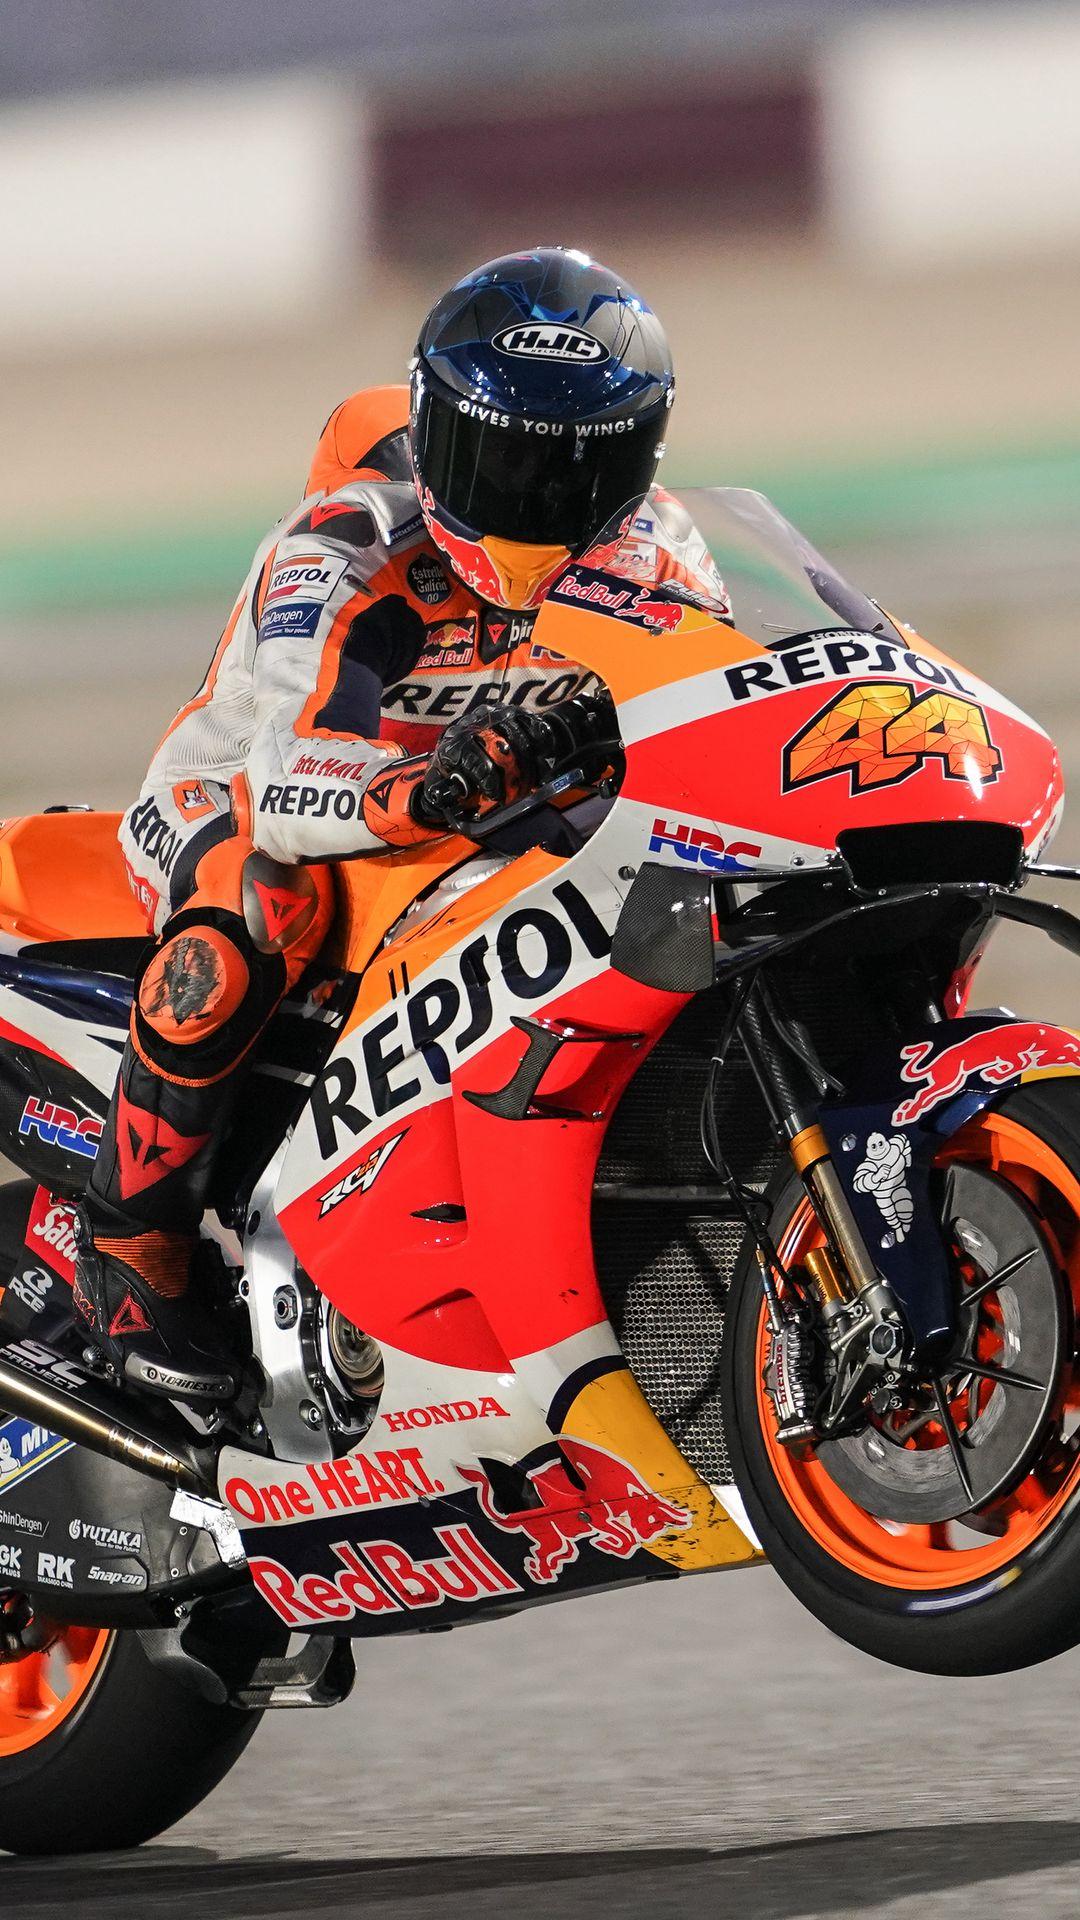 1080x1920 Wallpaper honda, motorcycle, motorcyclist, helmet, speed, track, orange